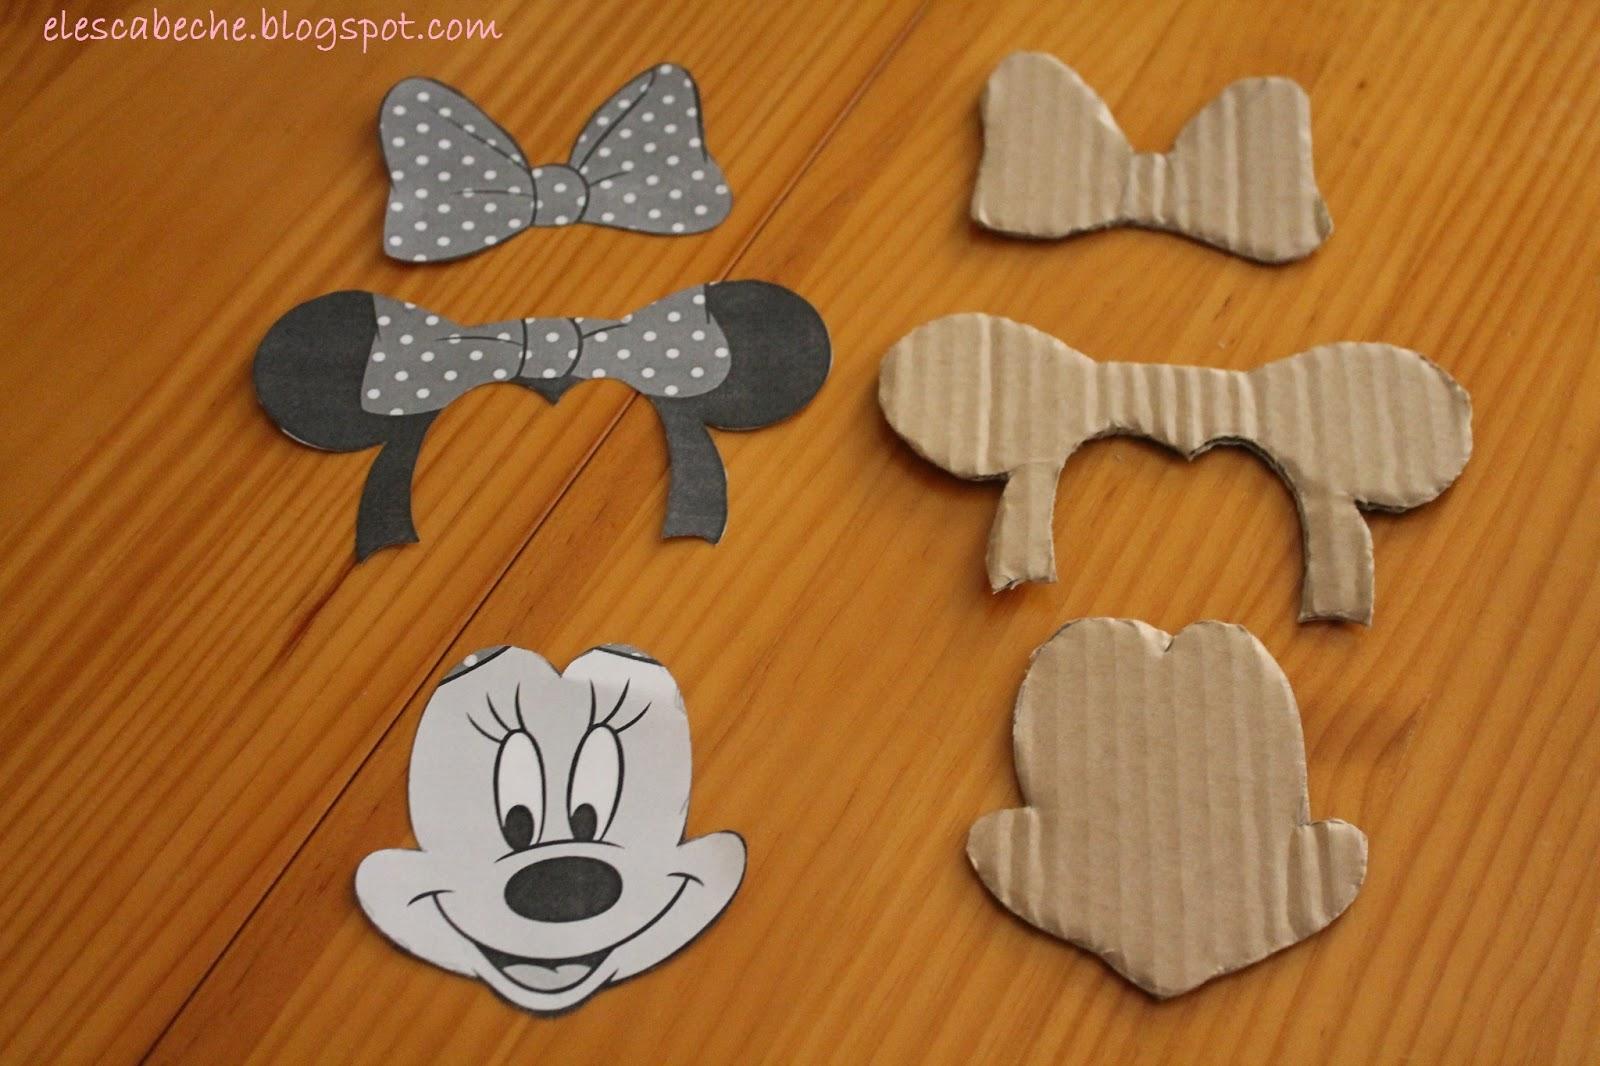 Cara De Minnie Mouse Molde's Para Imprimir